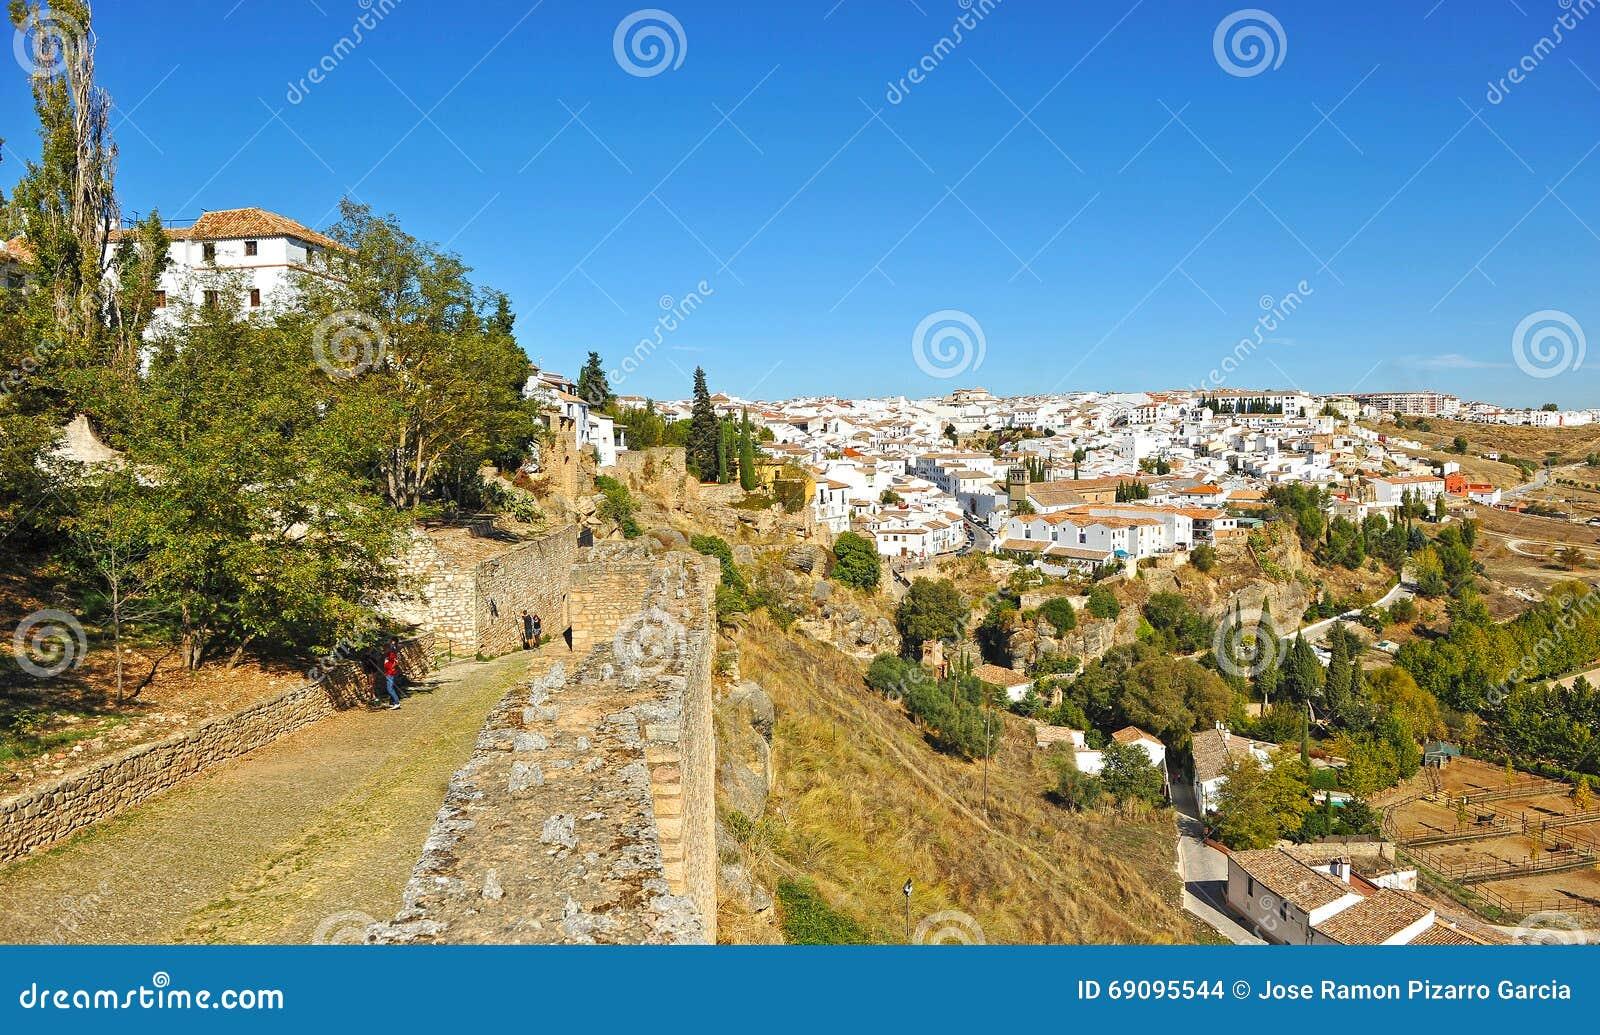 Panoramic view of Ronda, Malaga province, Spain